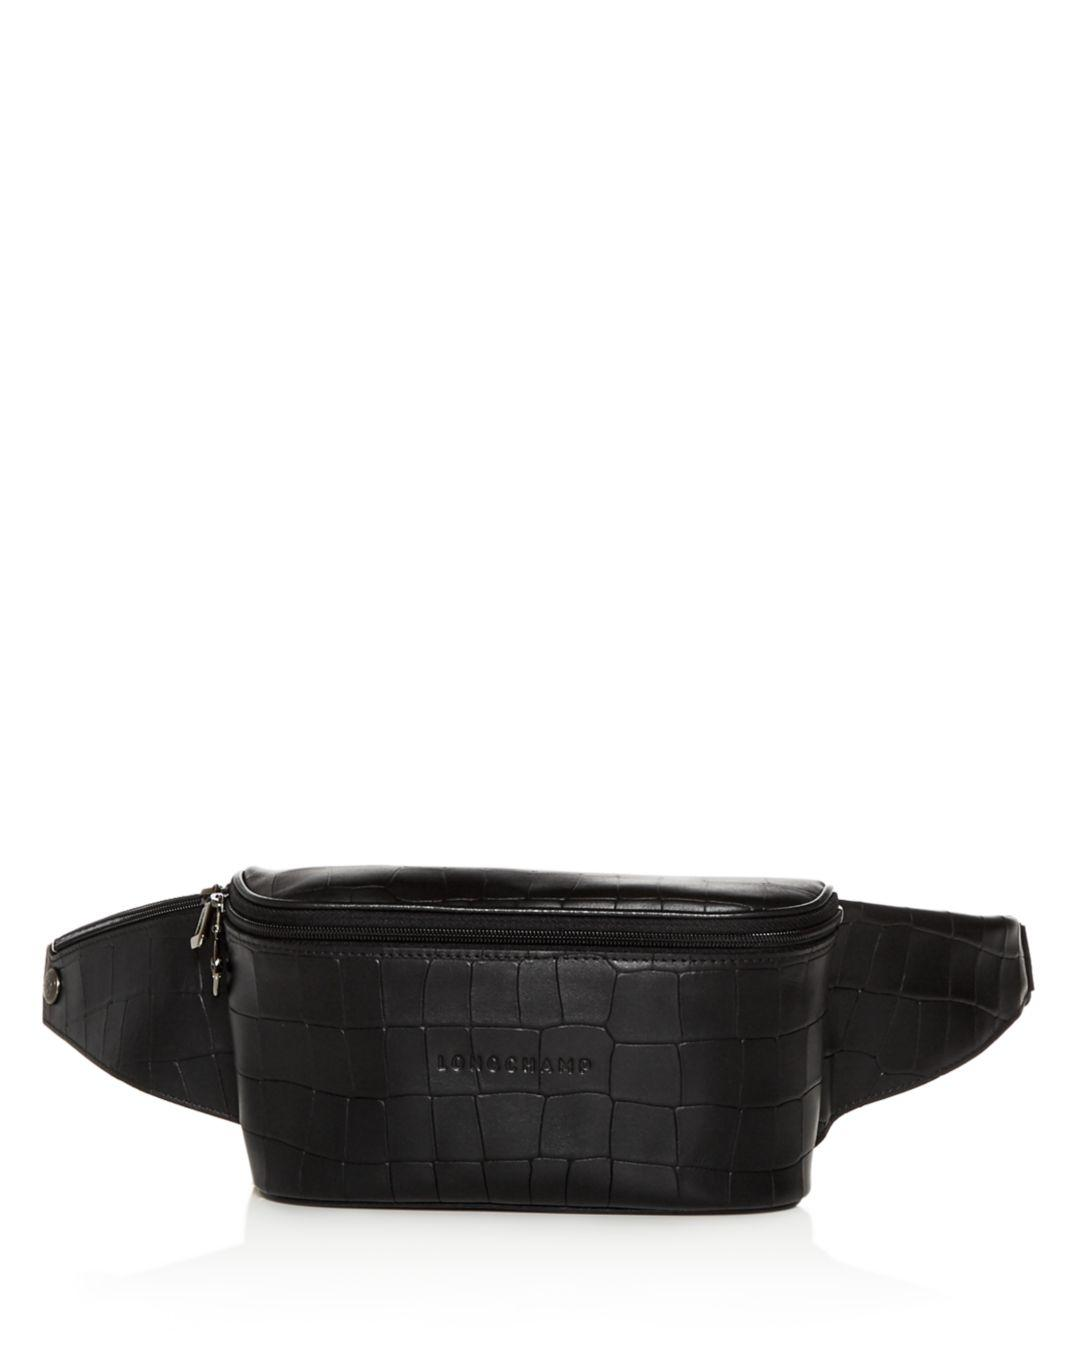 cd940cea3229 Longchamp Croc - Embossed Leather Belt Bag in Black - Save 6% - Lyst